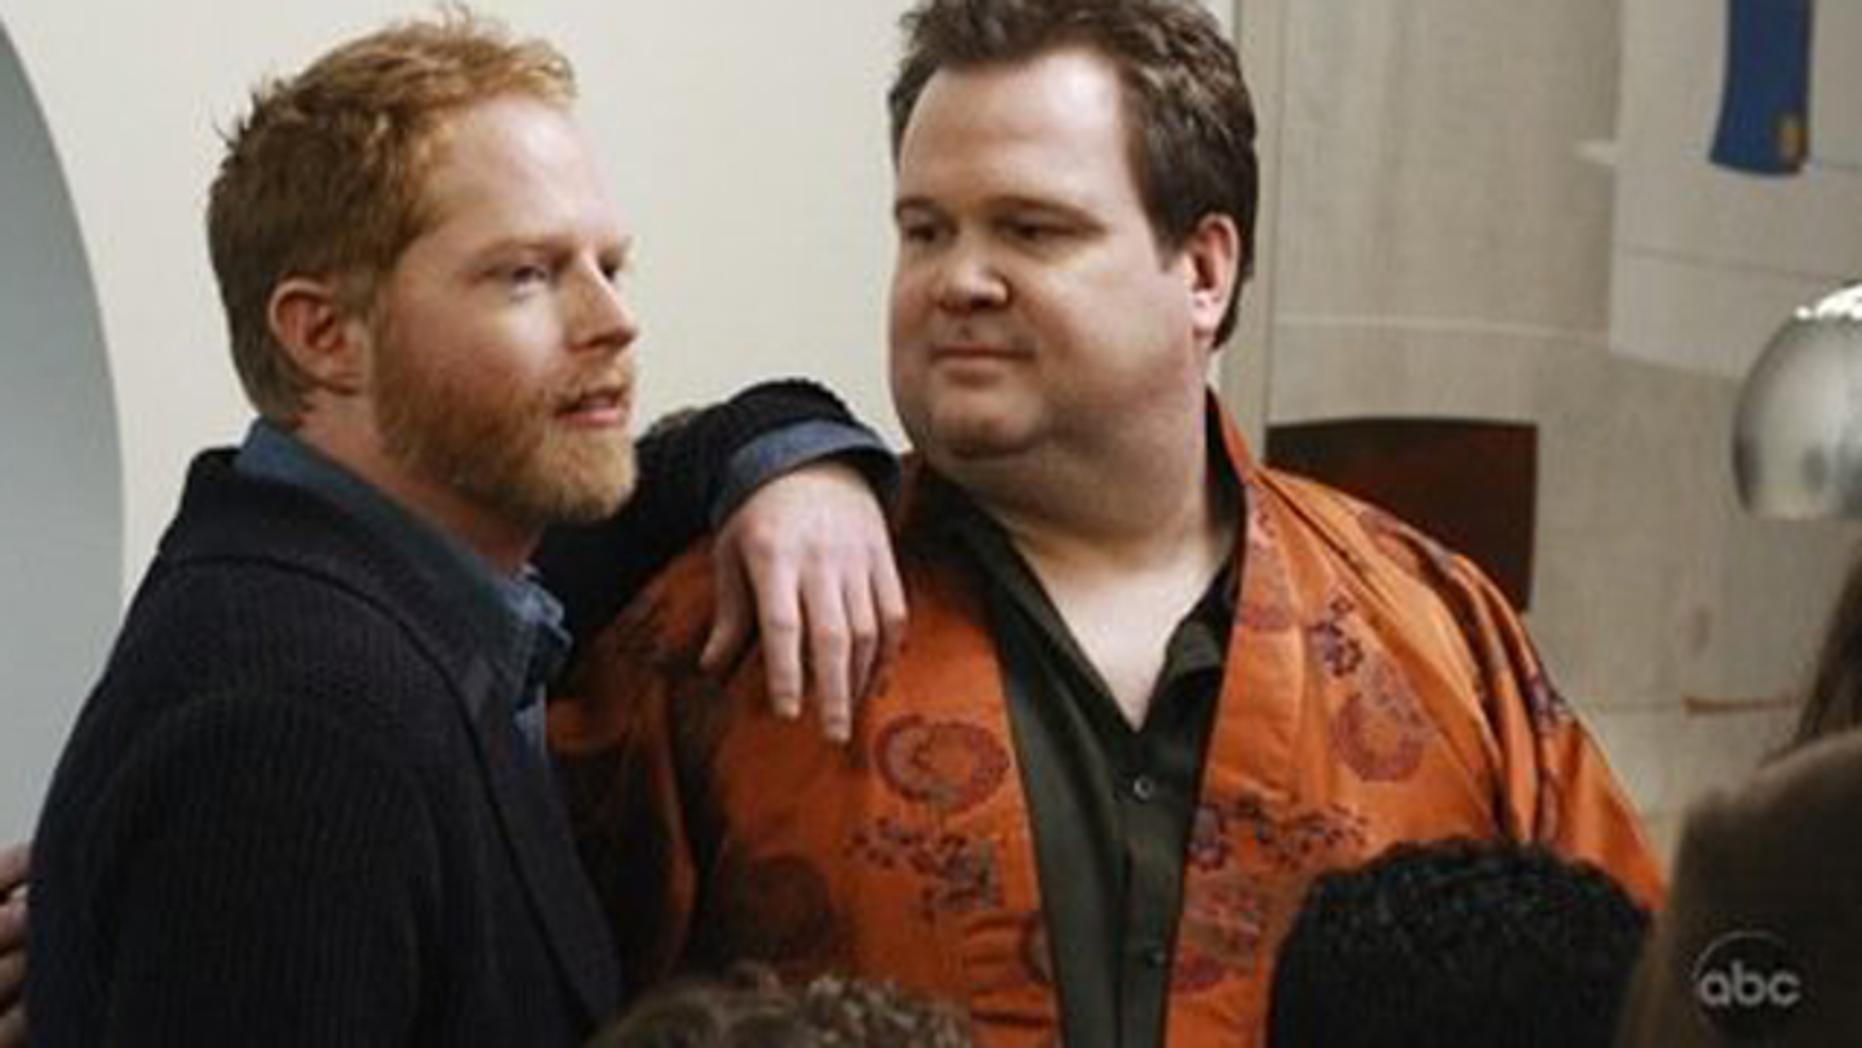 Mitchell Pritchett and Cameron Tucker ar a gay couple on 'Modern Family.' (ABC)